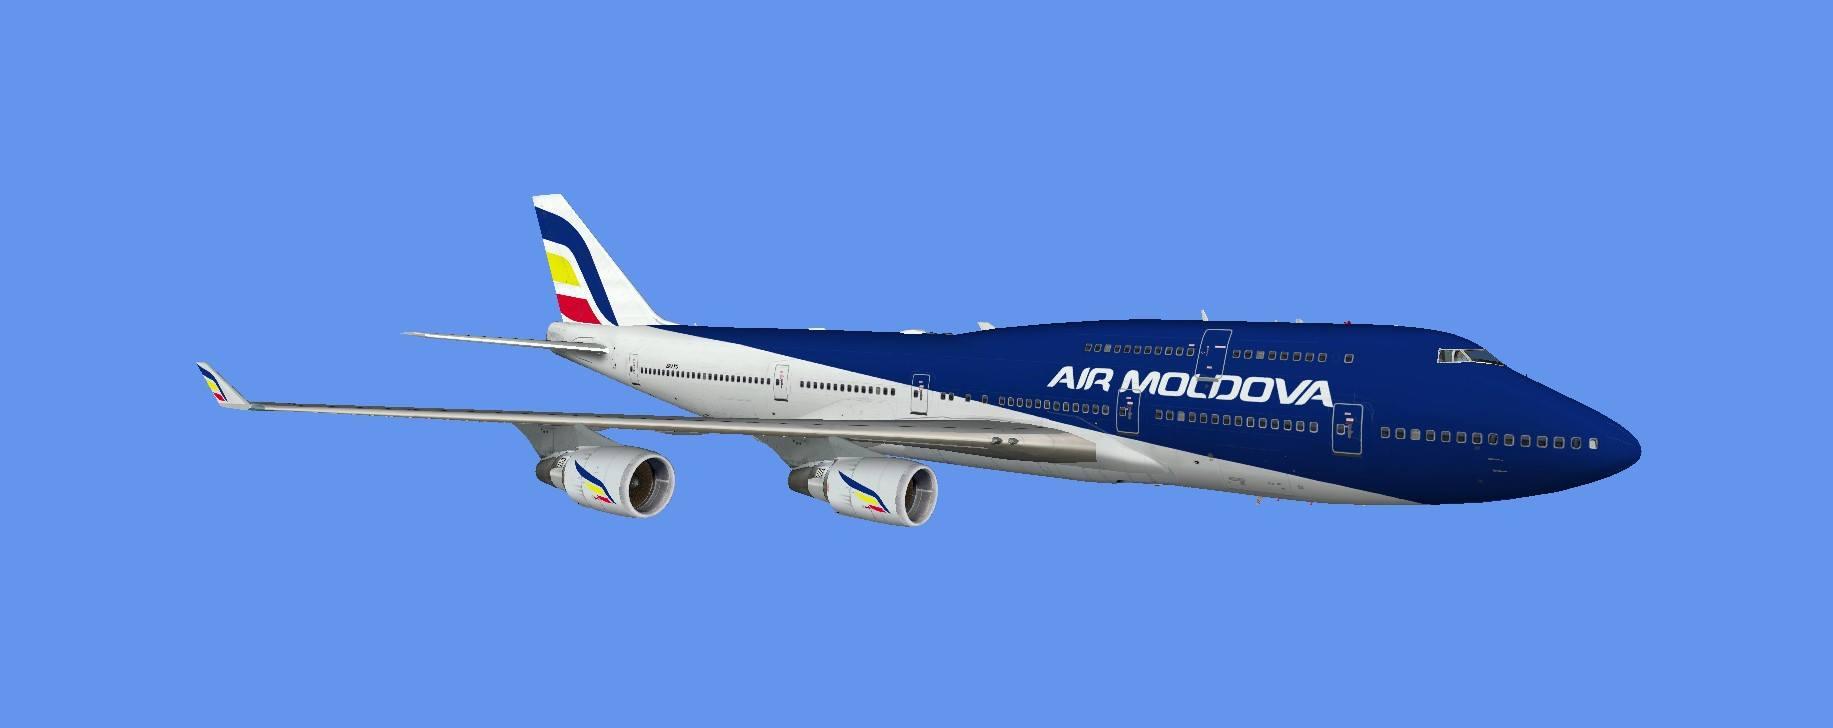 Plane liveries – Moldova VACC